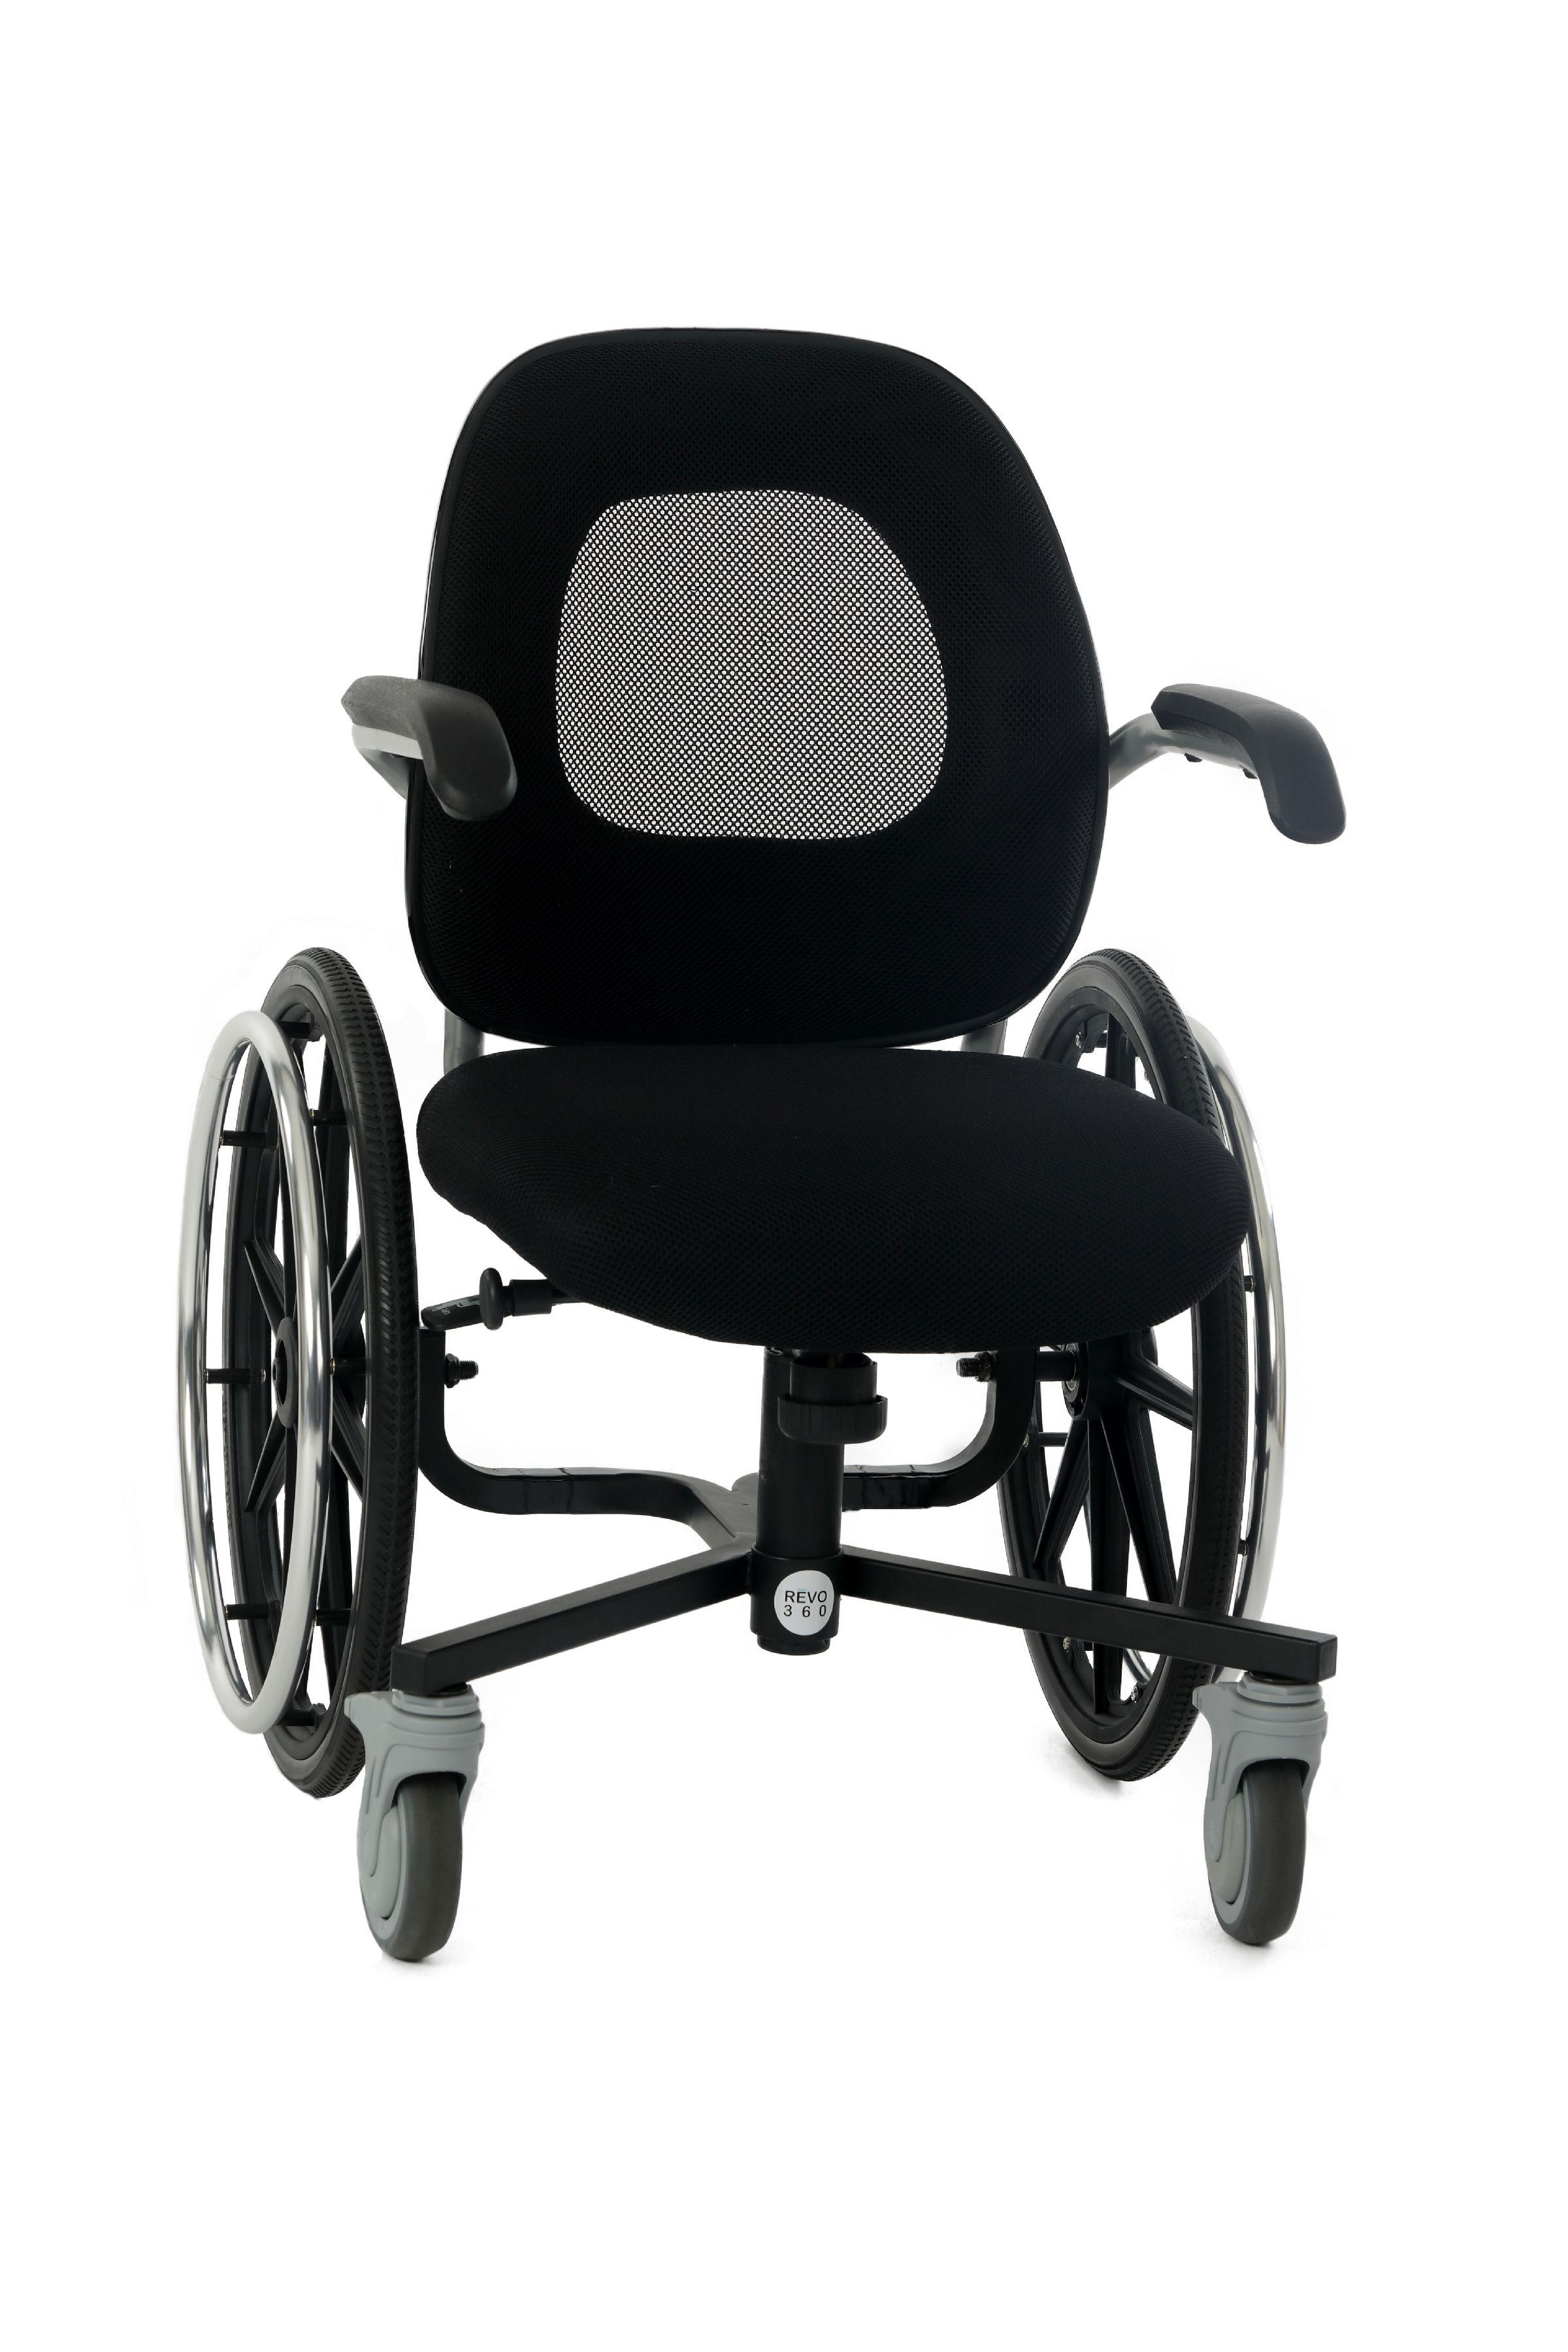 revo 360 slim-line daily living chair